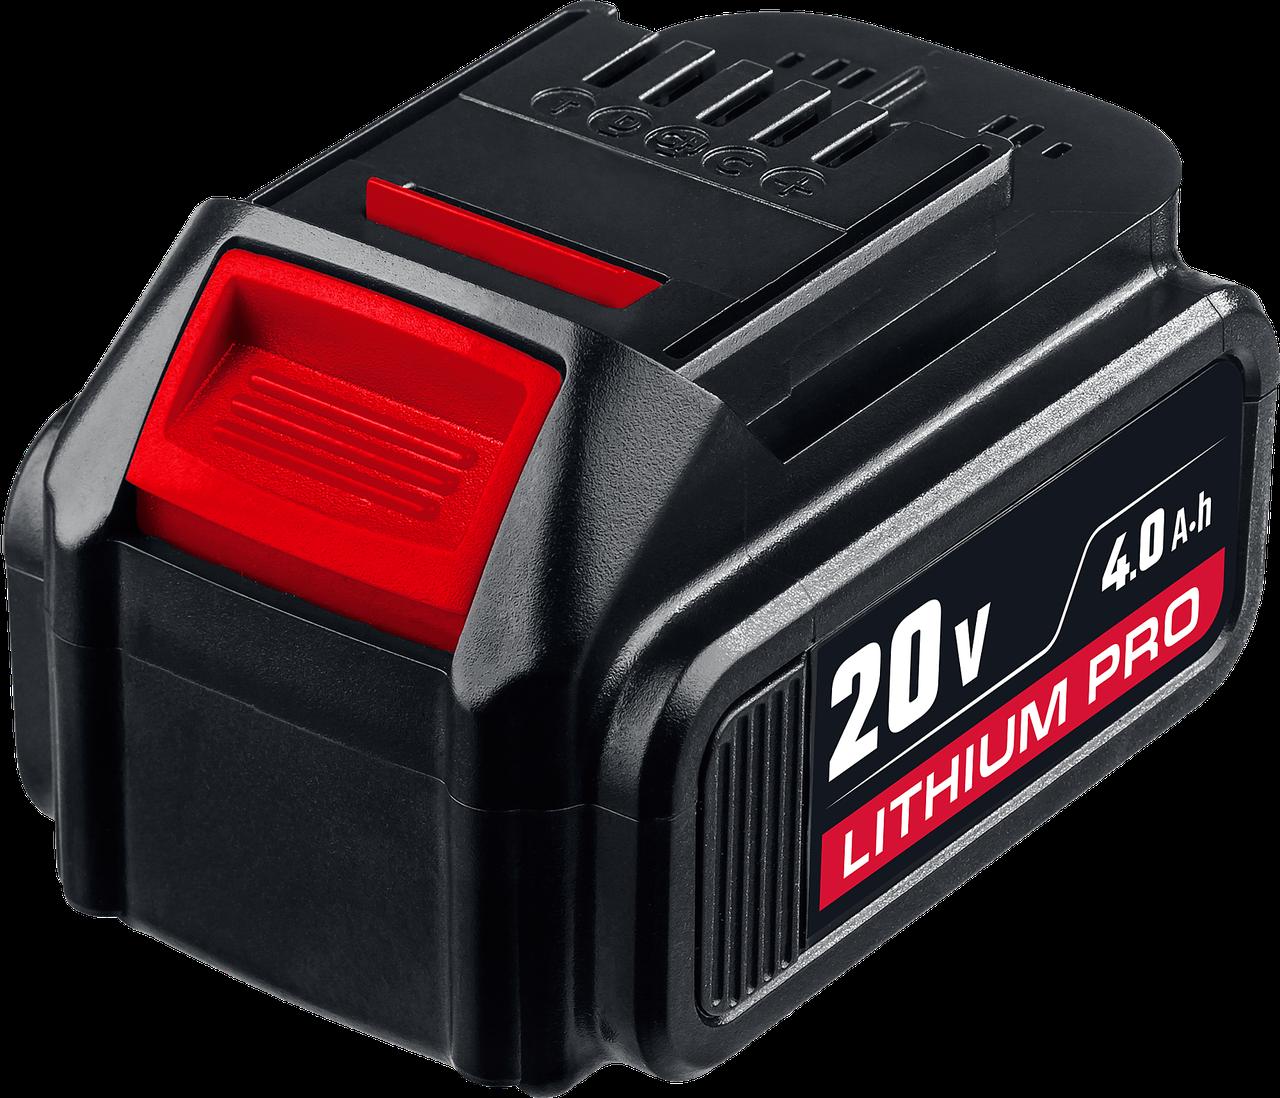 S-18-4 T7 Аккумуляторная батарея 18 В, Li-Ion PRO, 4.0 Ач, ЗУБР Профессионал